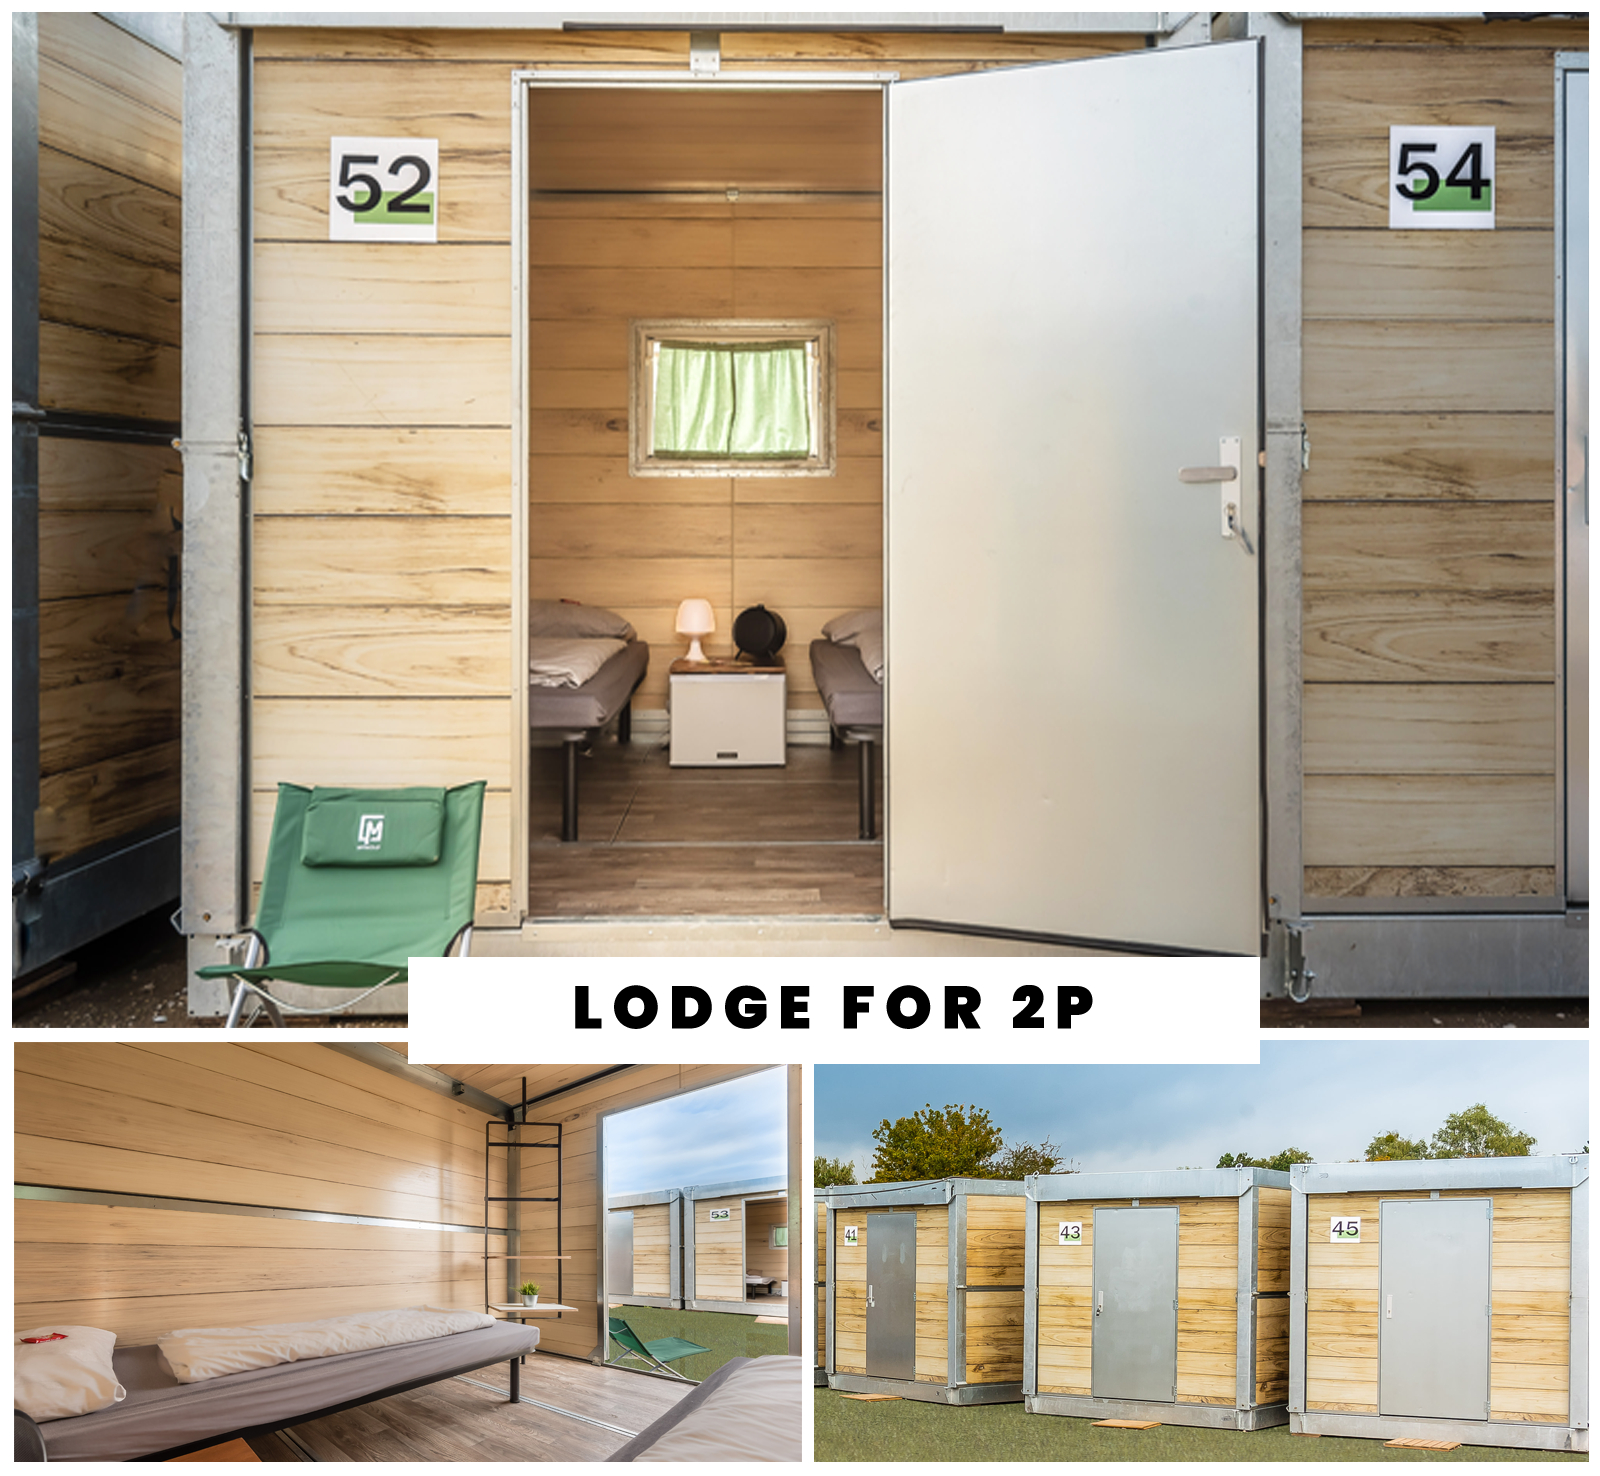 airbnb-titelbild-lodge-asgard-domo